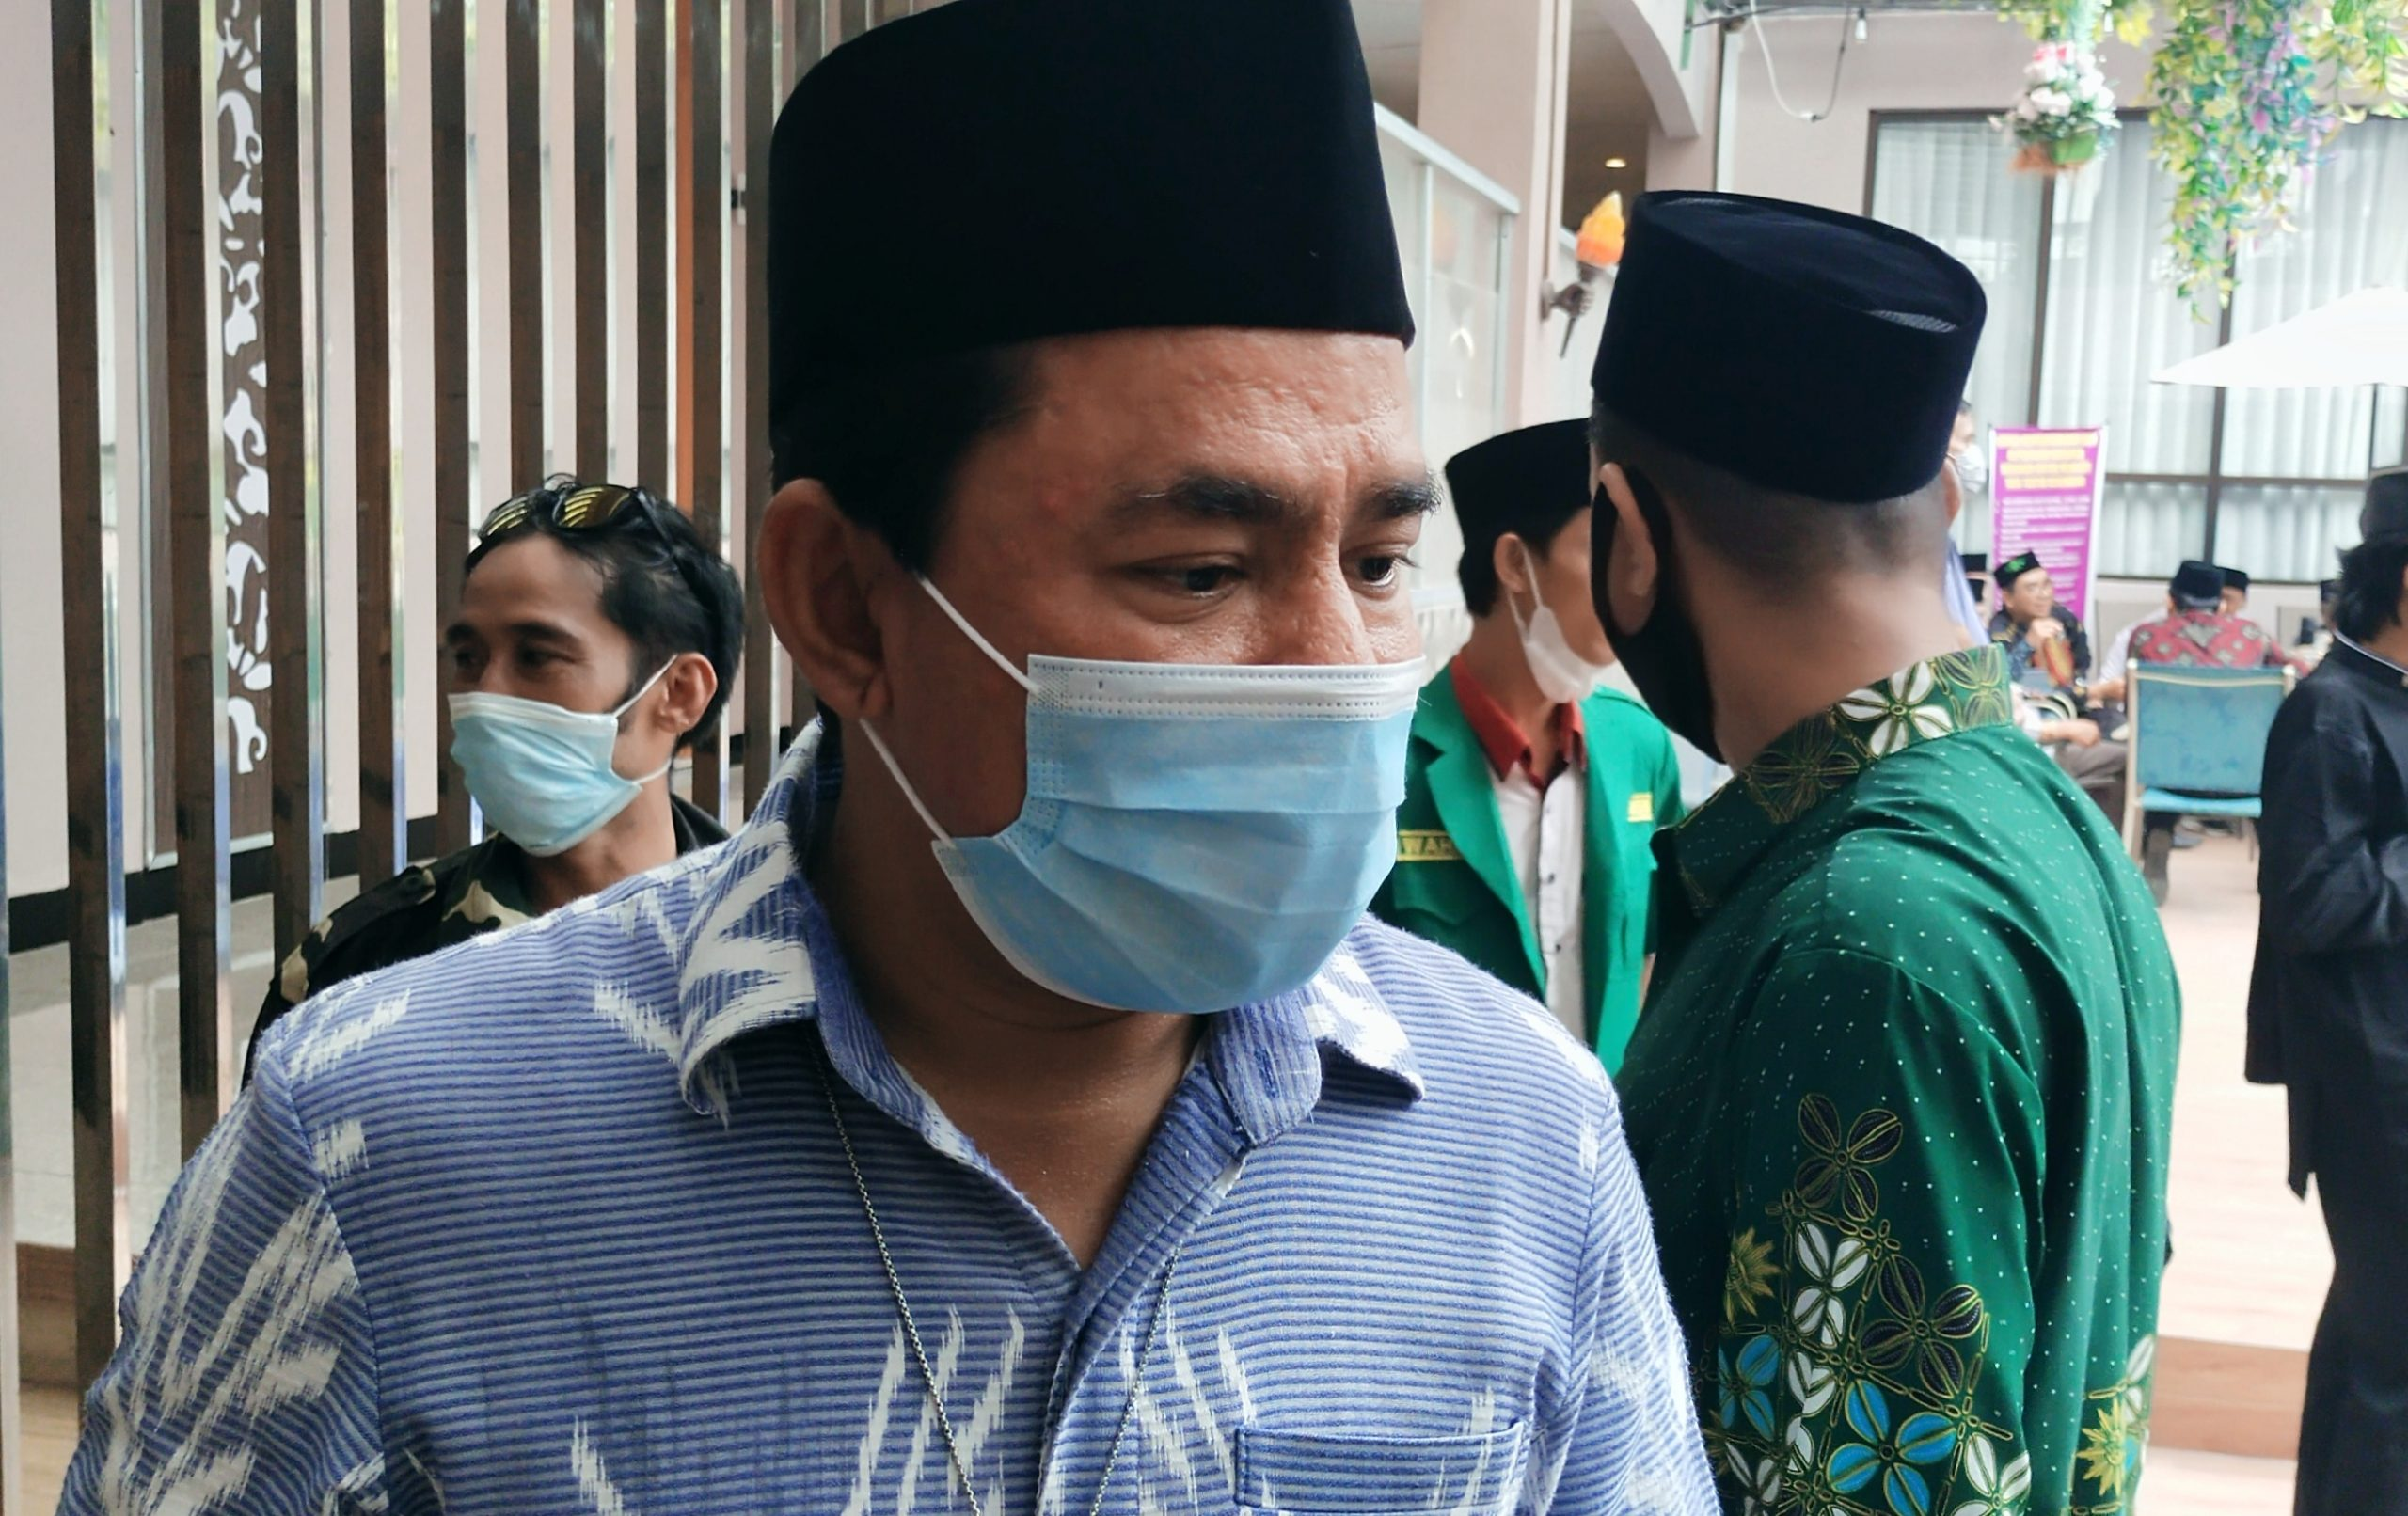 Kasus Kekerasan Seksual Anak Meningkat, Ini Komentar Ketua DPRD Sumbawa